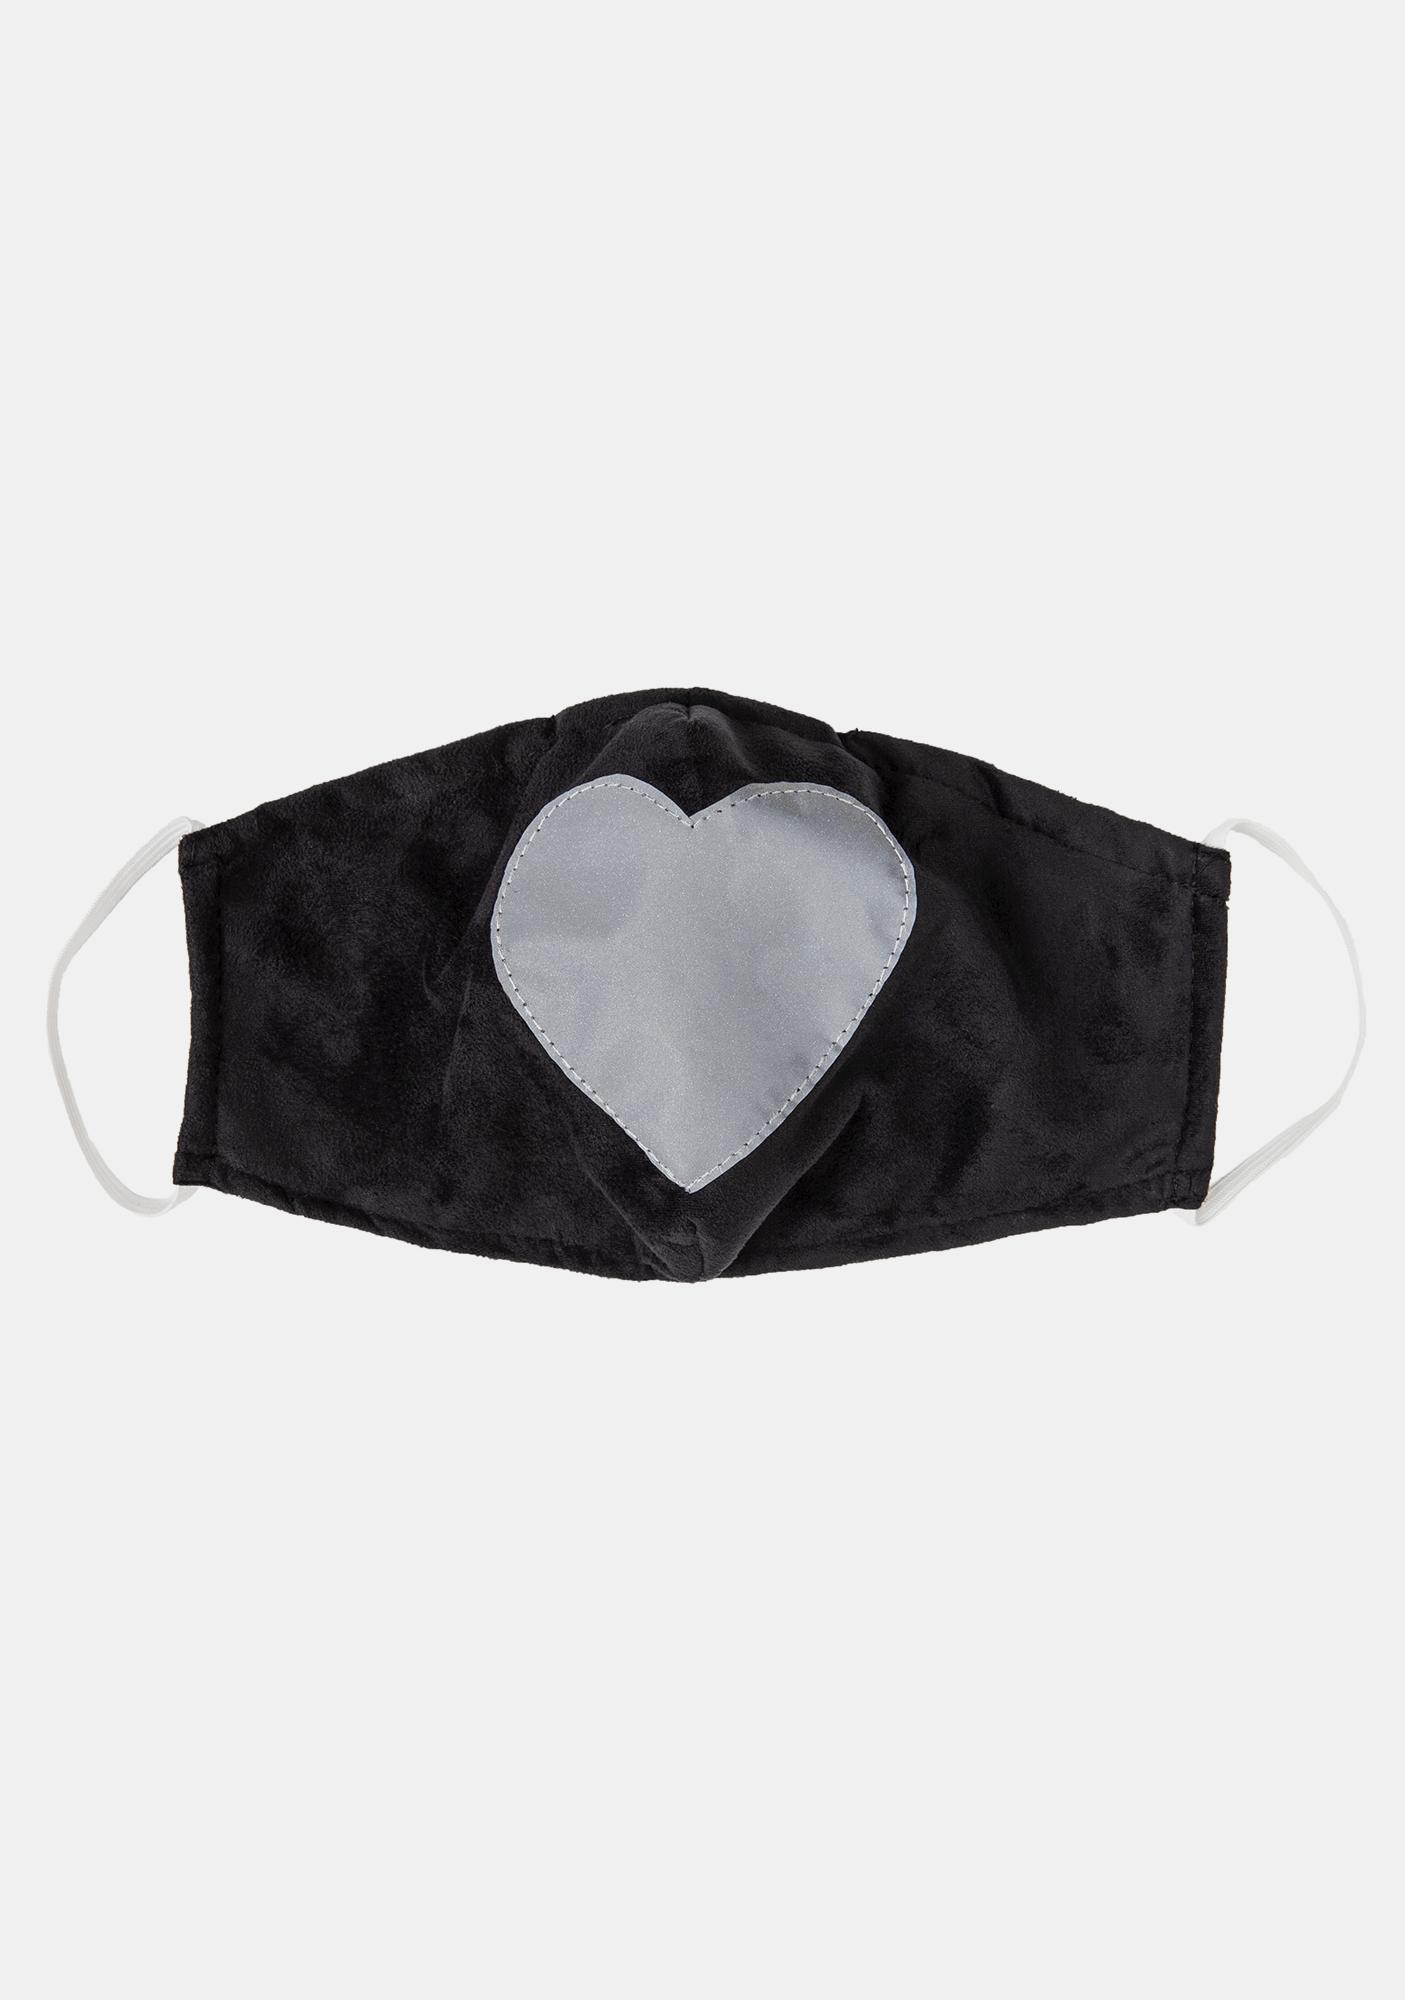 ESQAPE Reflective Heart Face Mask